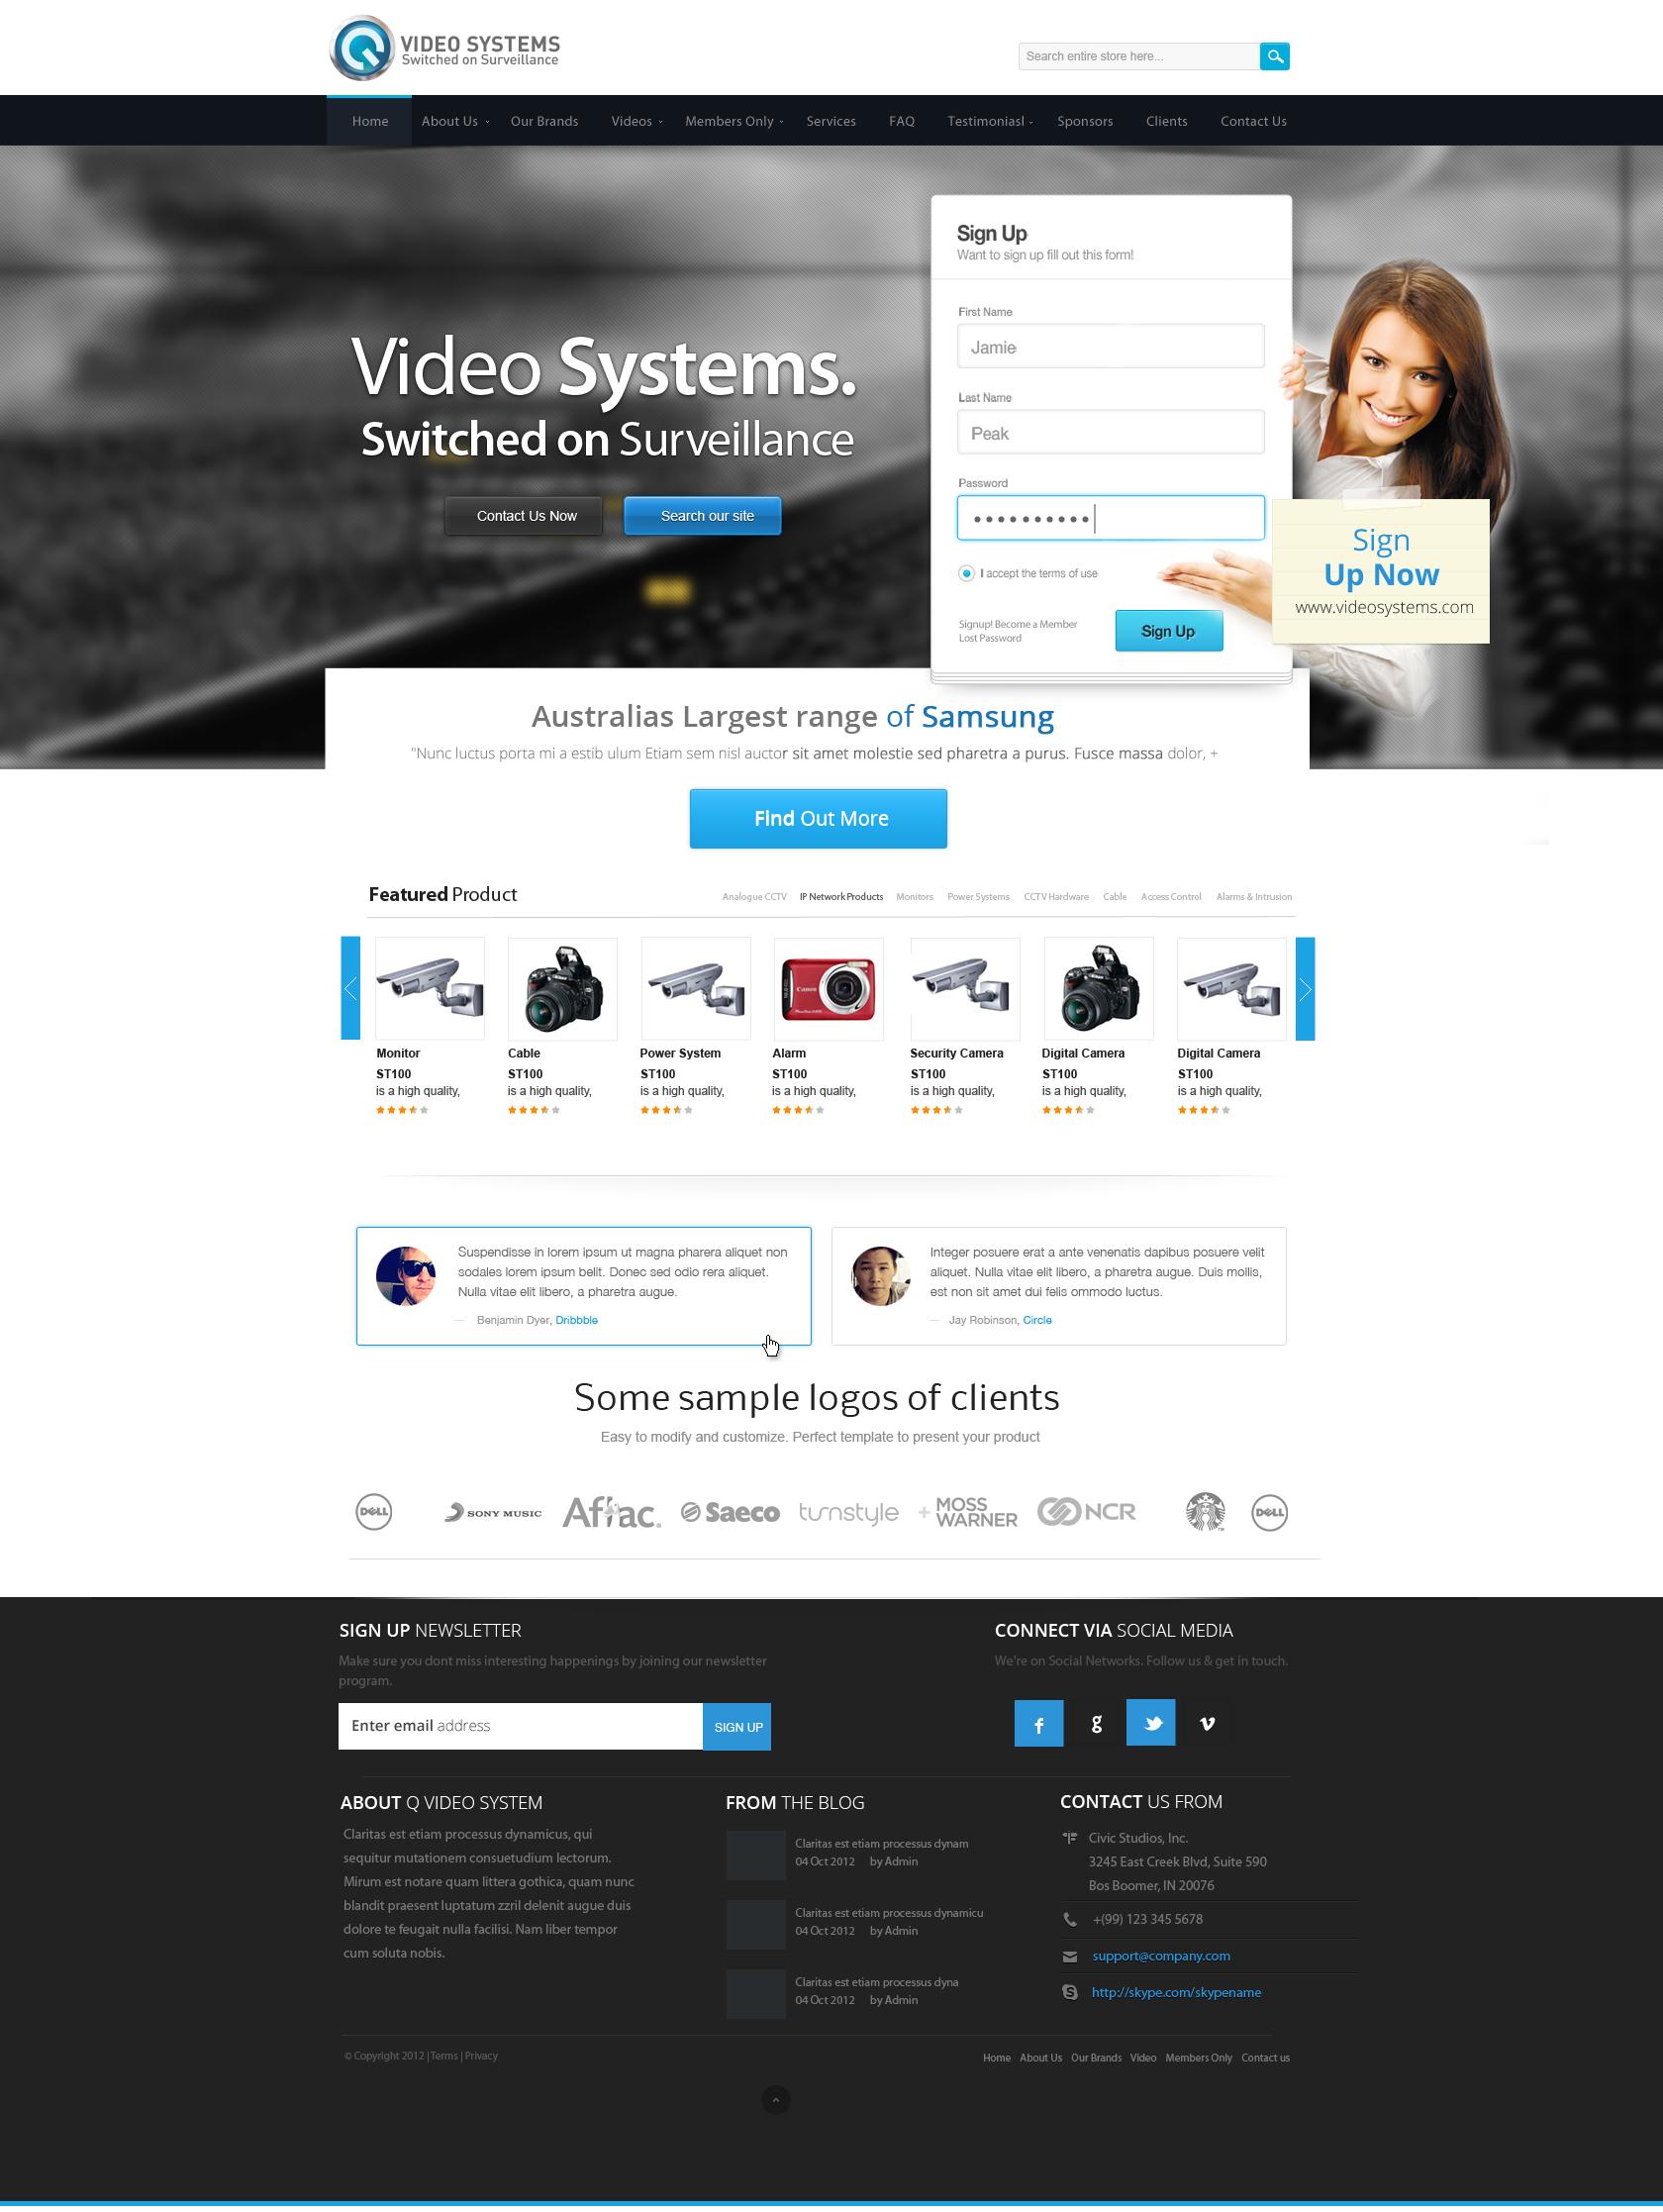 Video System Web Design by vasiligfx